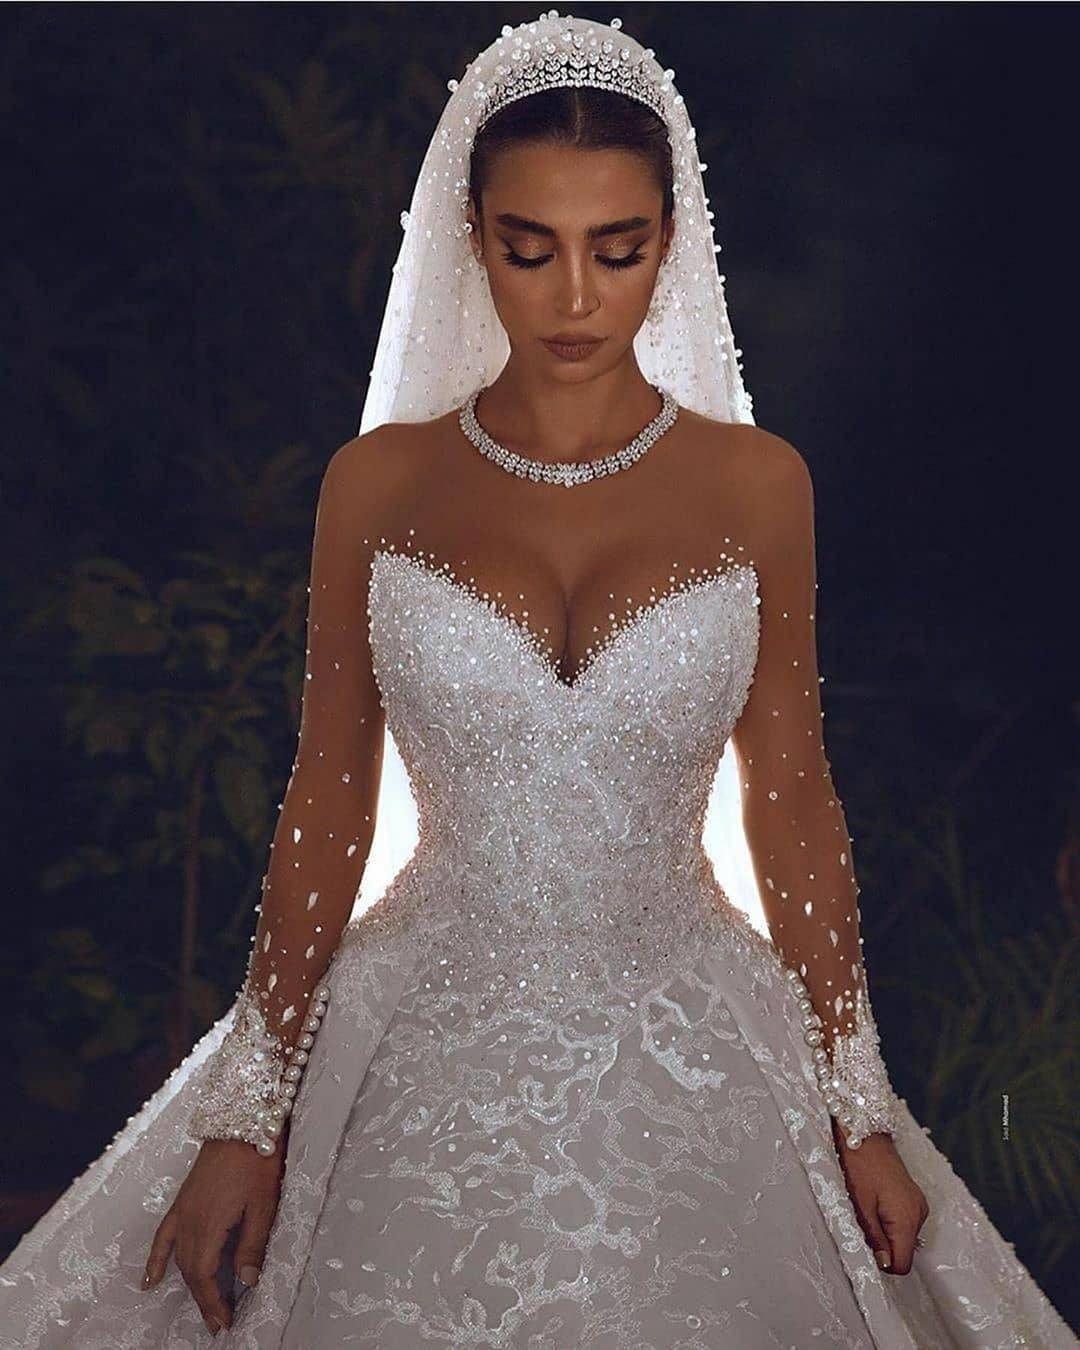 Primerblender On Instagram Which One Do You Like Love Makeup Follow Us Primerblender In 2020 Wedding Dresses Ball Gowns Wedding Ball Gown Wedding Dress